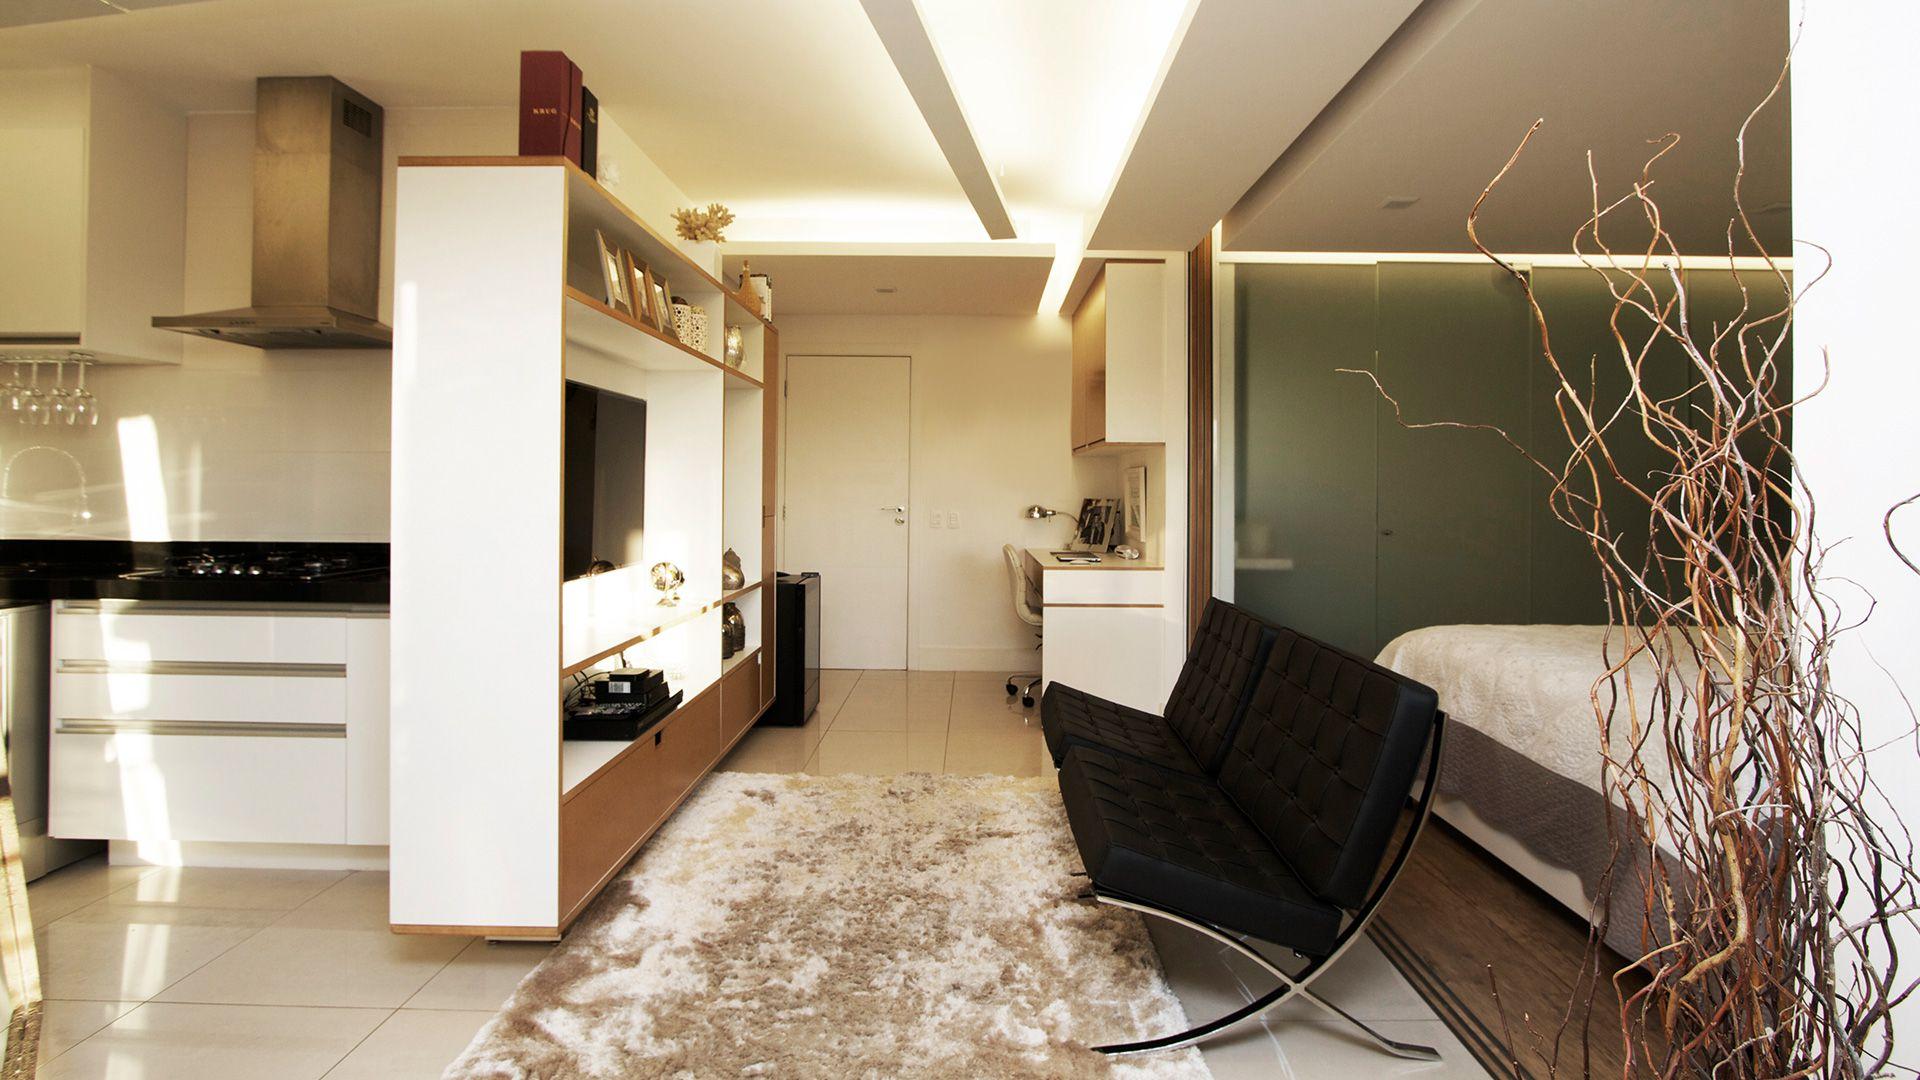 apartamento-ibirapuera-foto-cozinha-sala-quarto